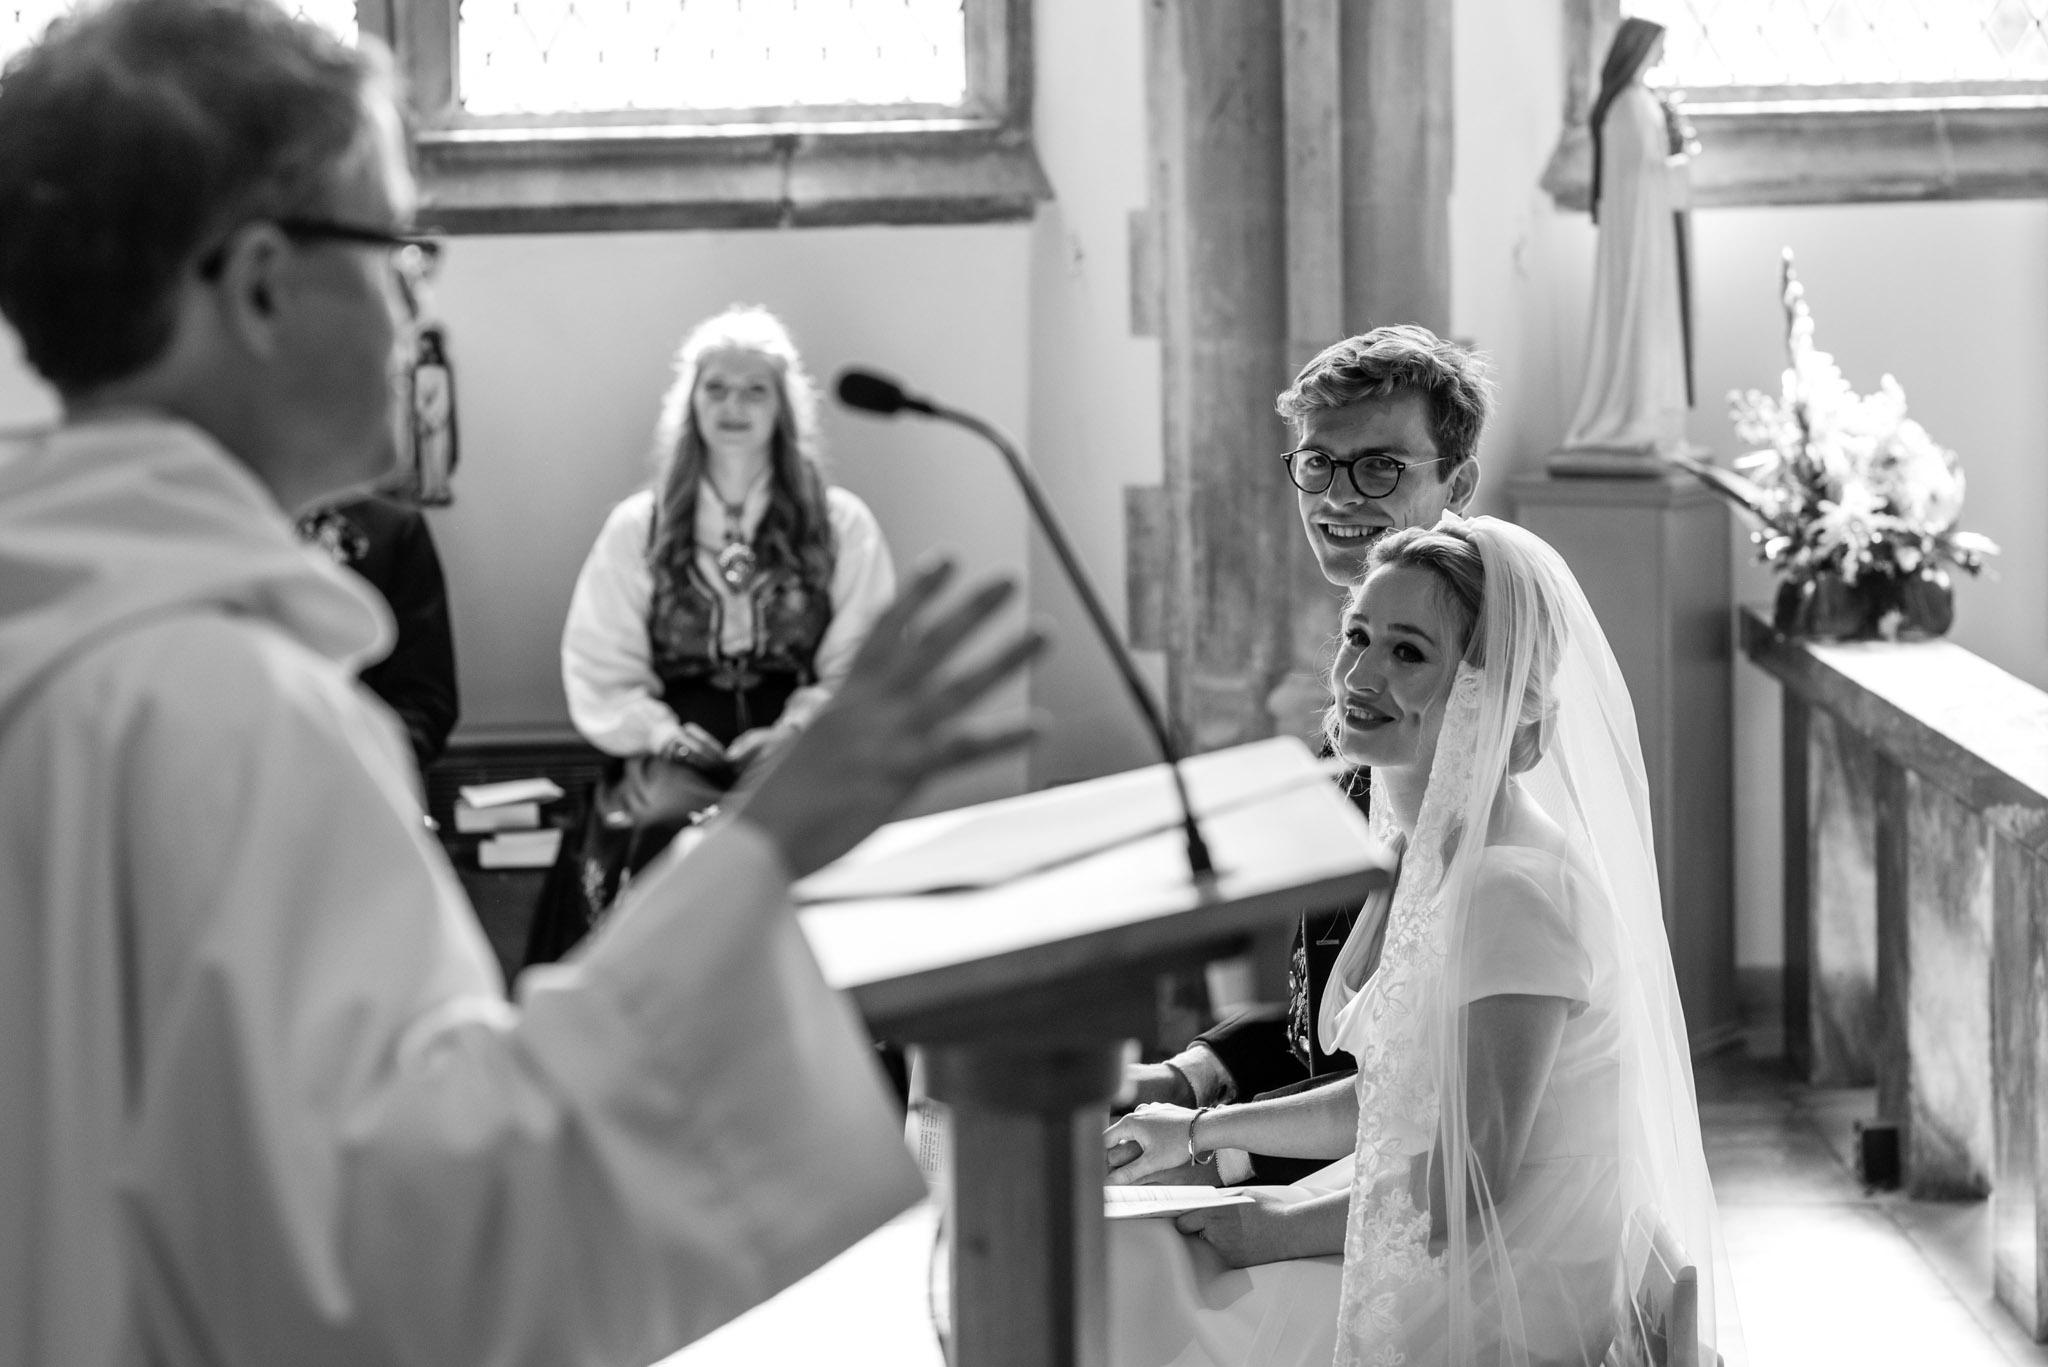 Priest's Sermon